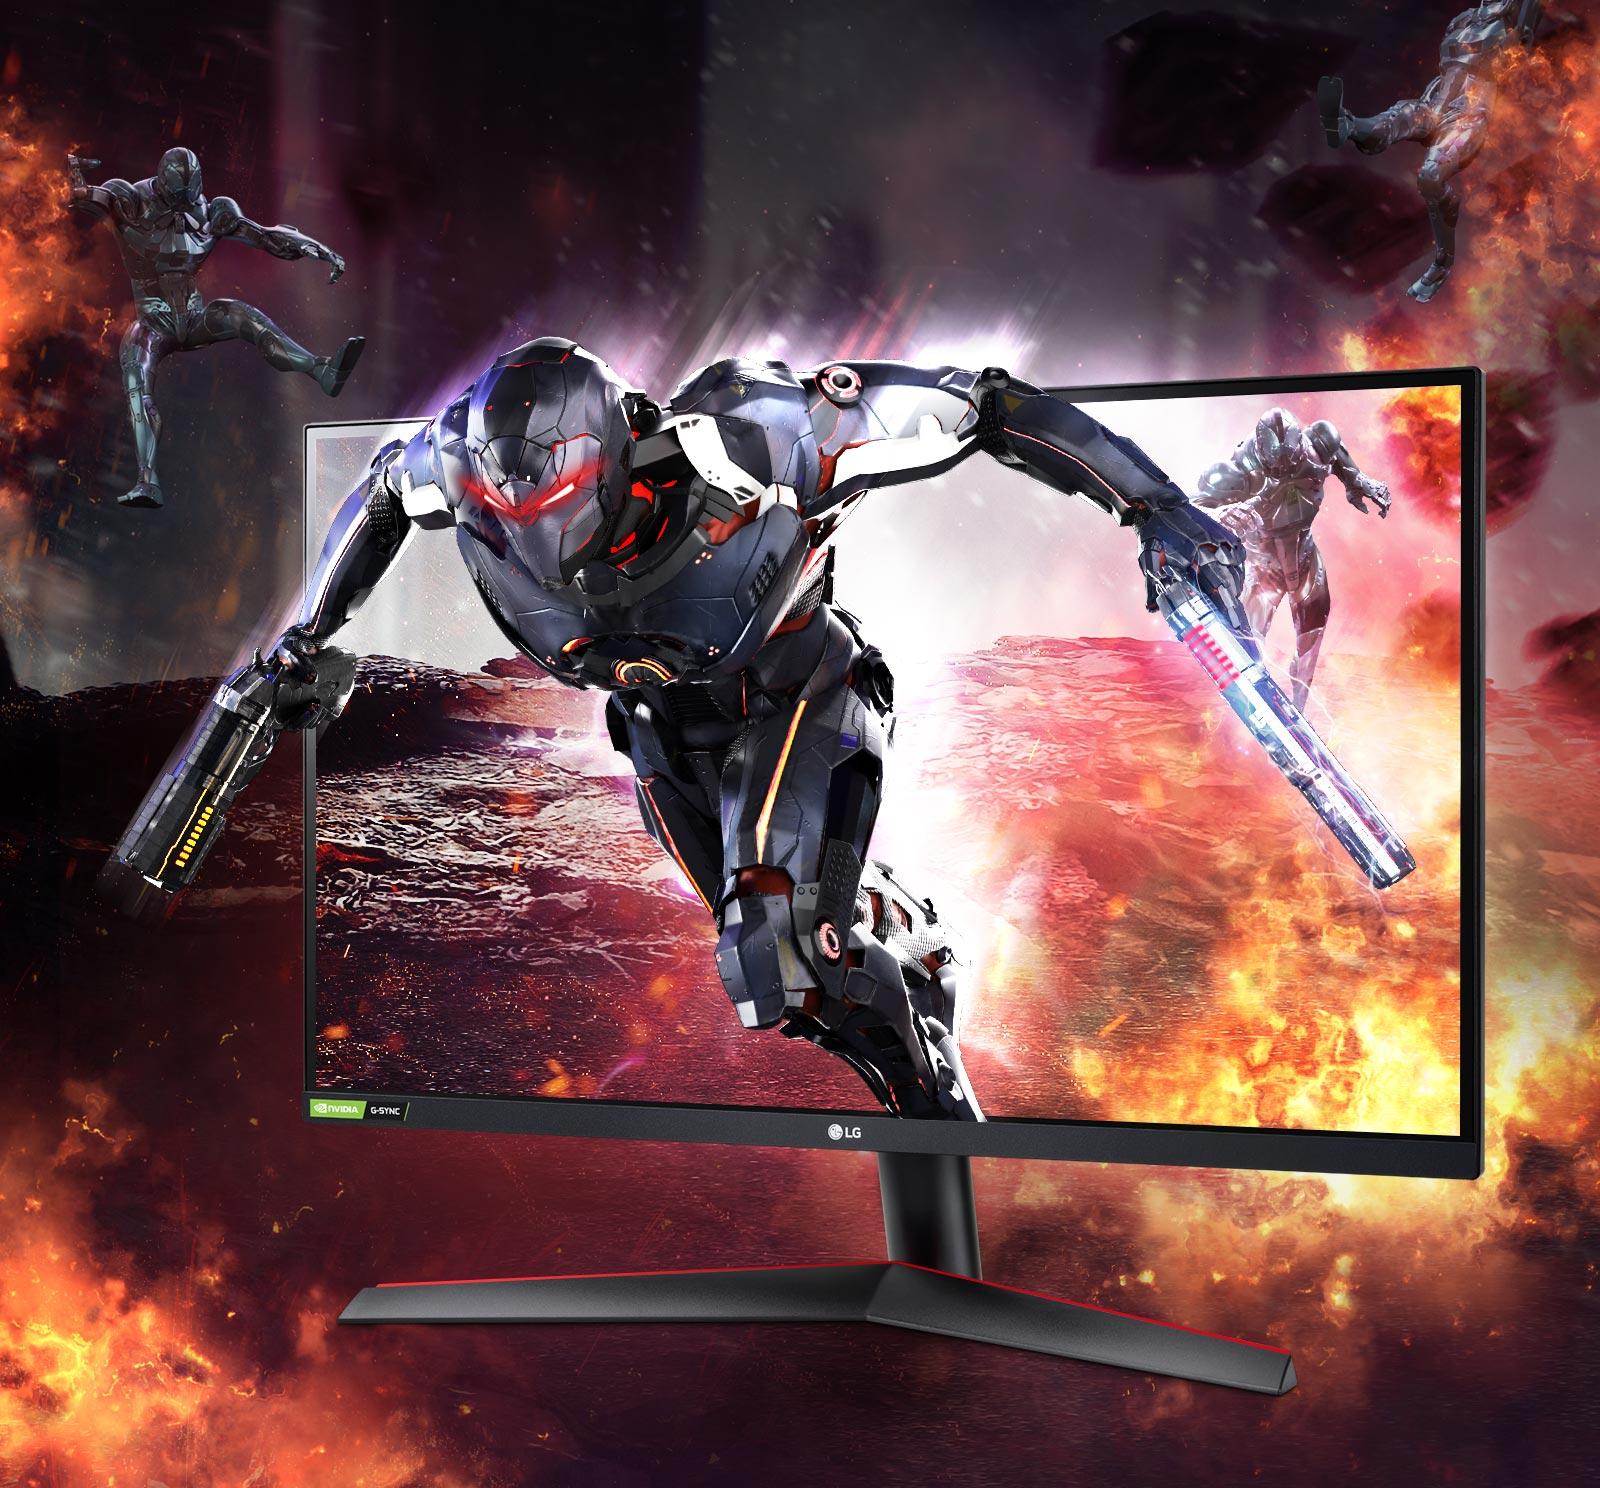 Monitor LG Ultragear kao snažan zaslon za vaše videoigre